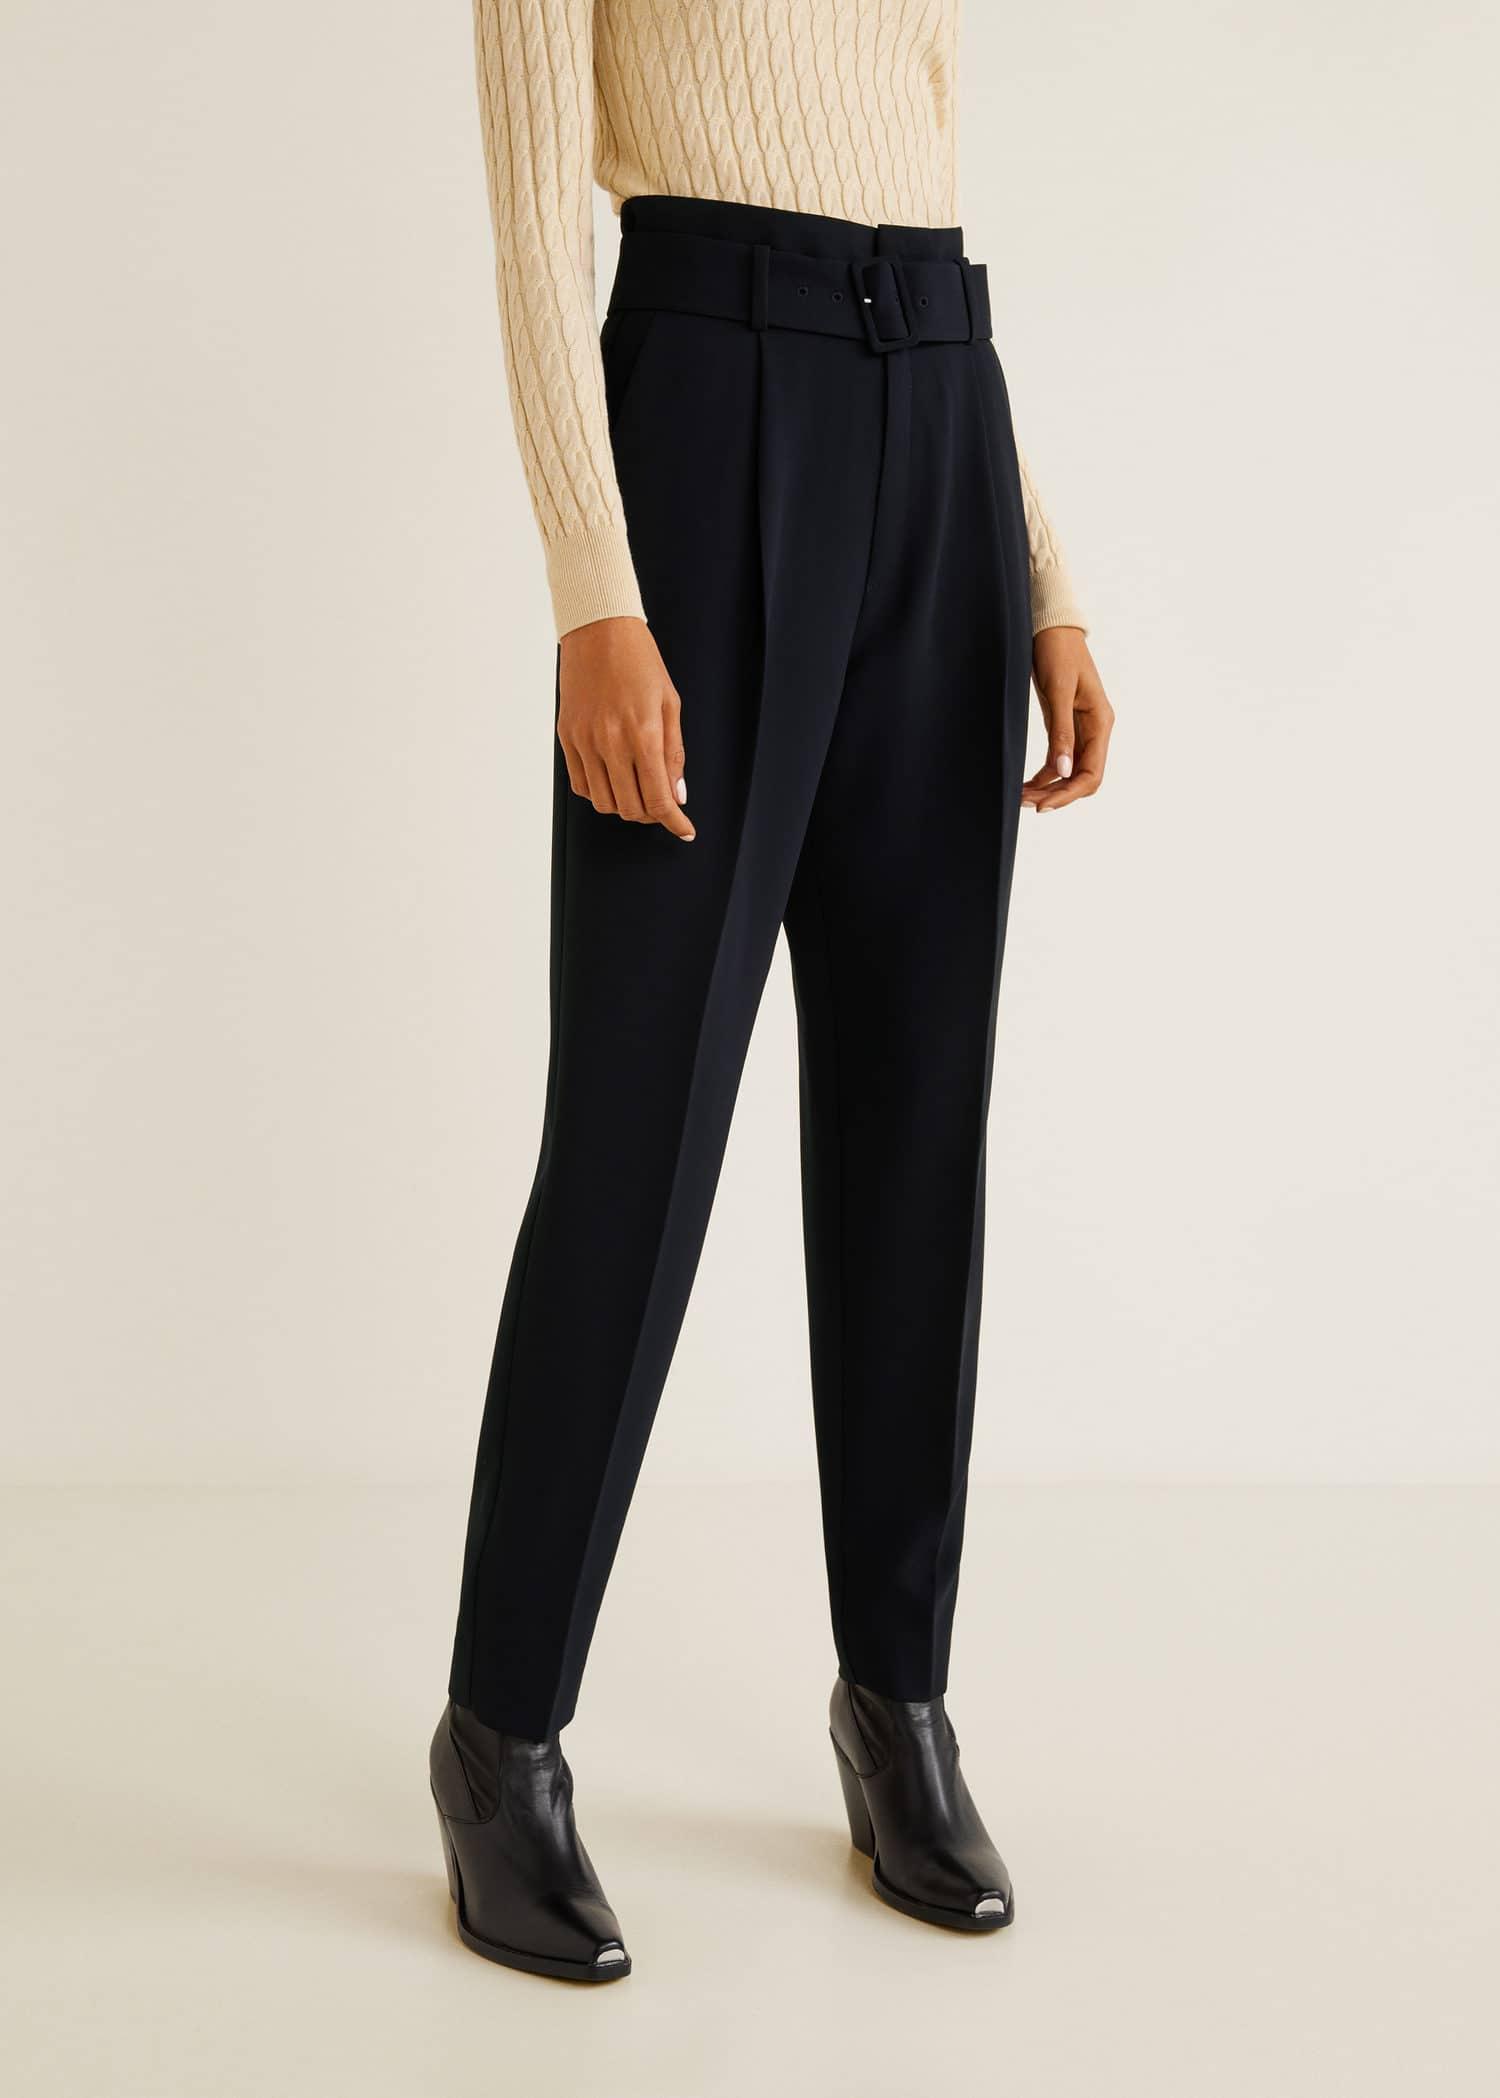 Cantidad limitada mejor sitio lindos zapatos Pantalón tiro alto cinturón - Mujer   MANGO Uruguay